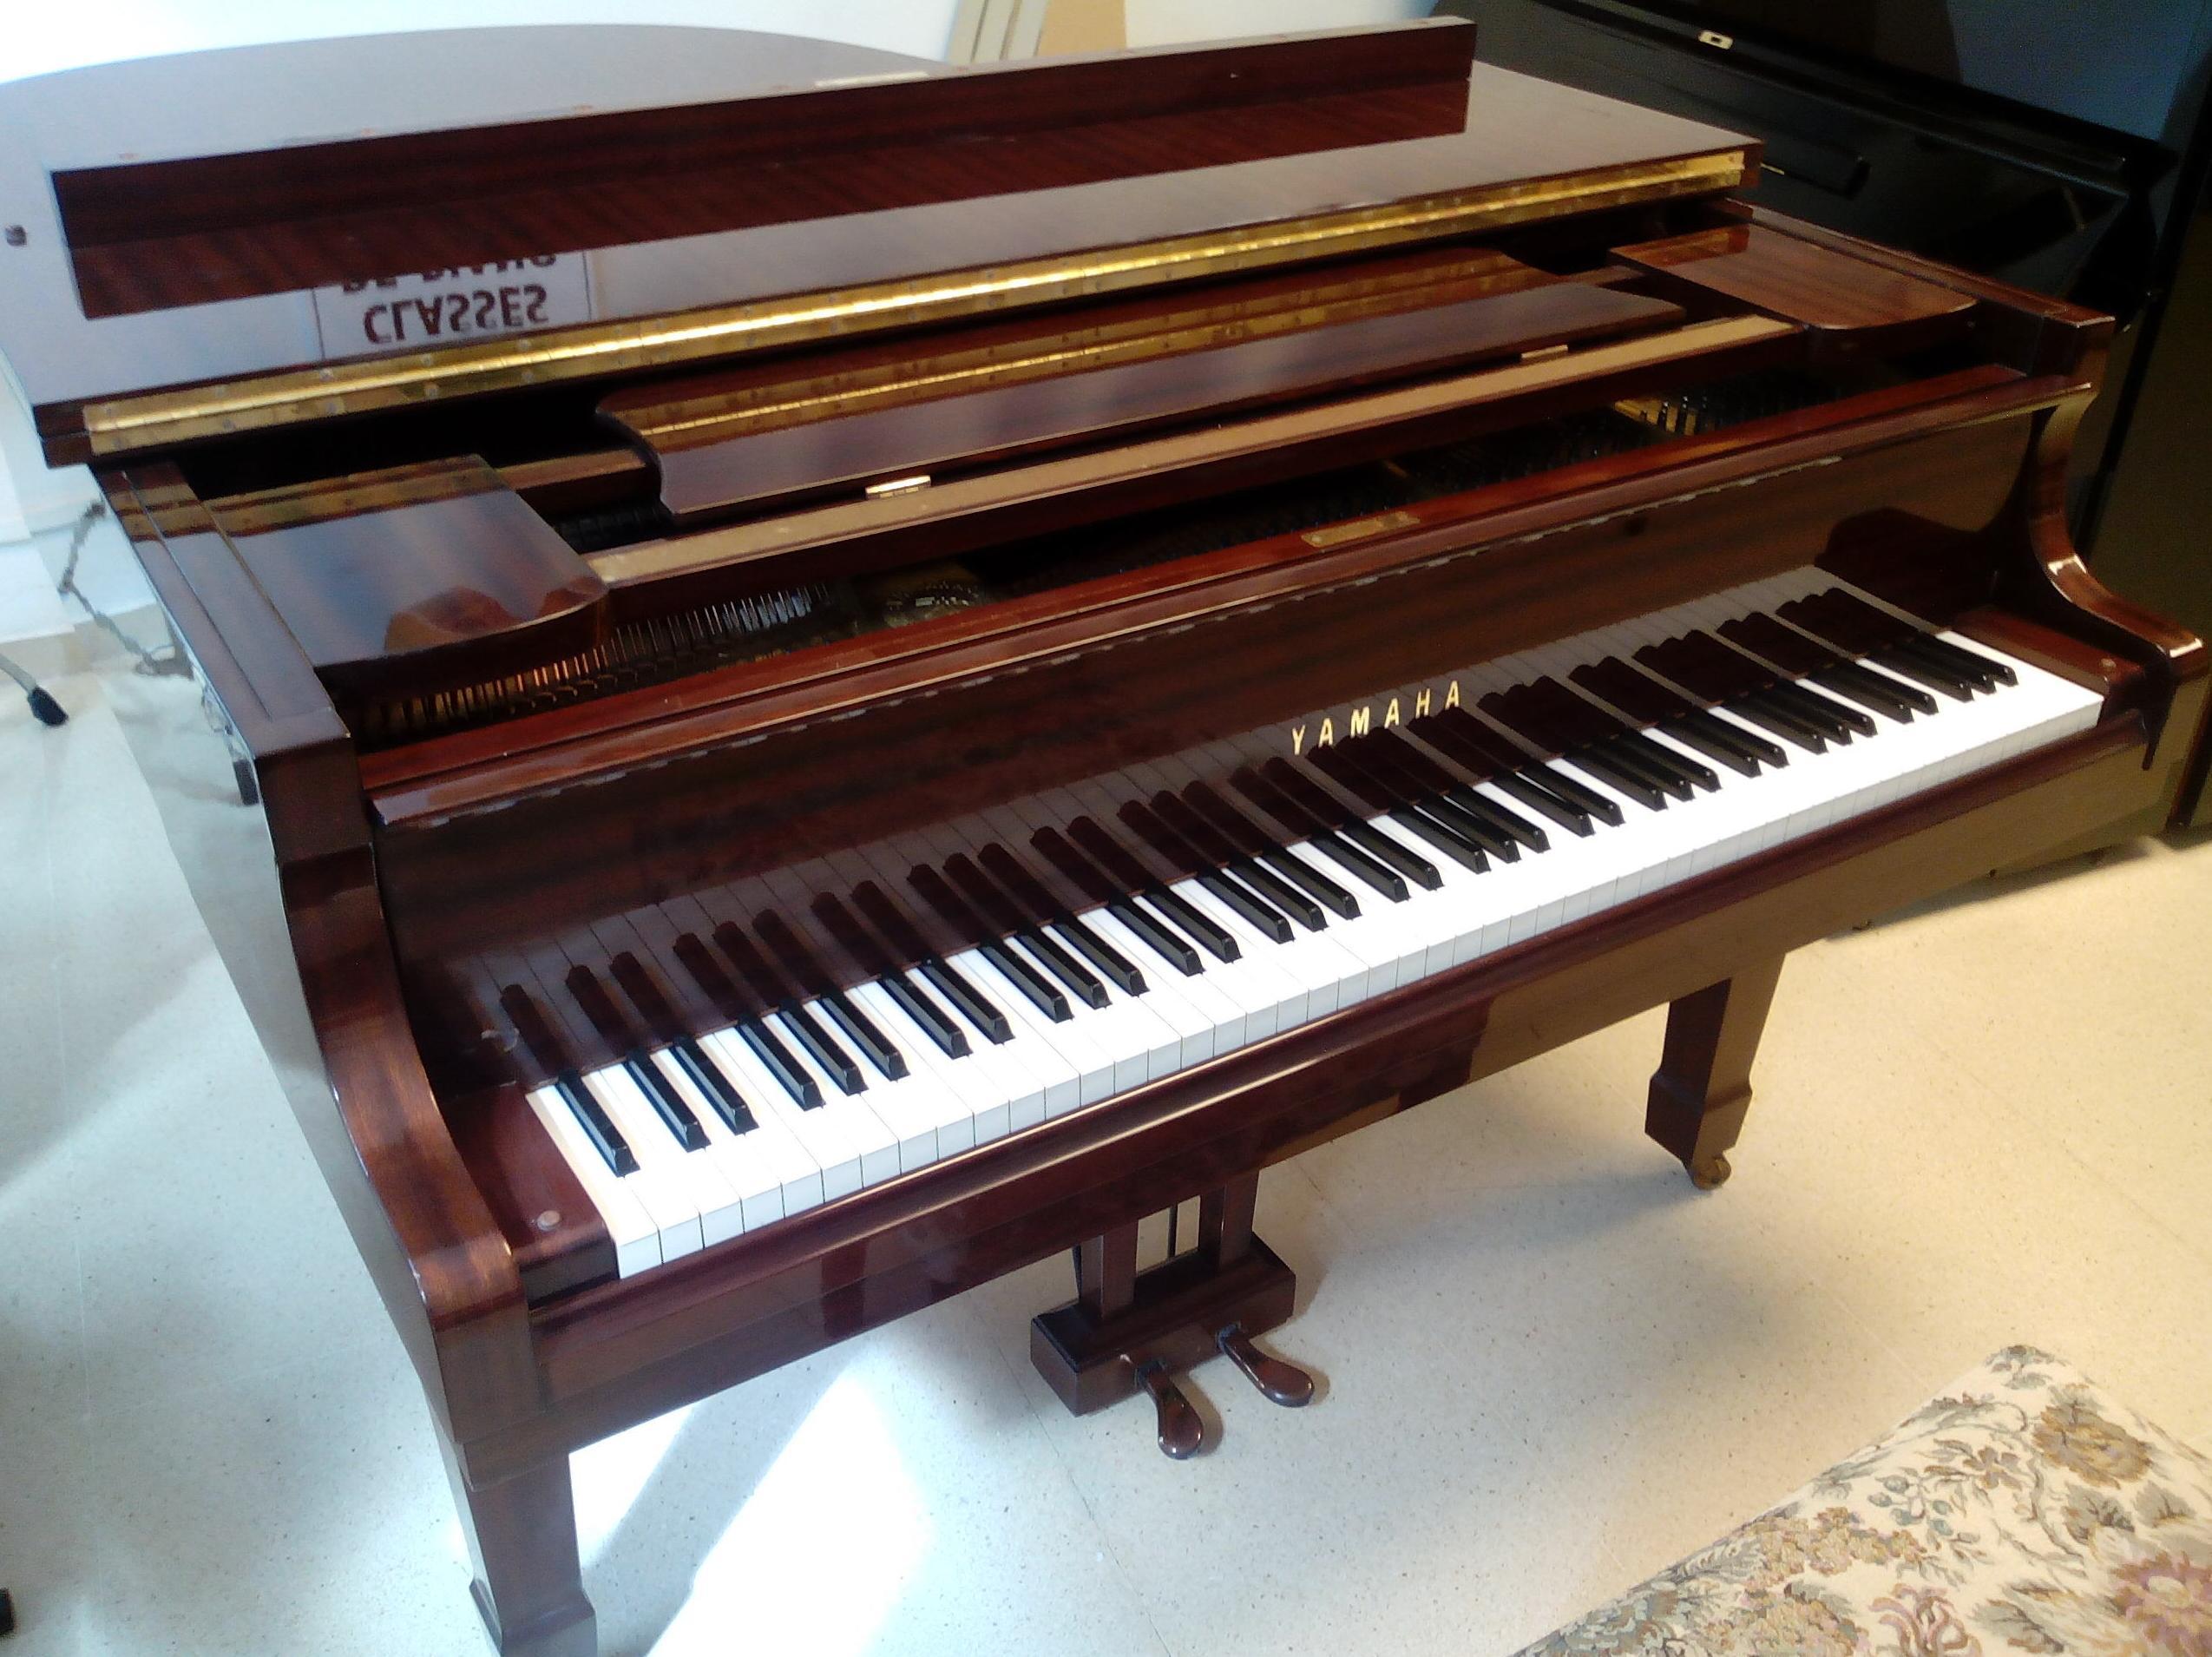 piano yamaha md g 2 color caoba cat logo de l 39 art guinard